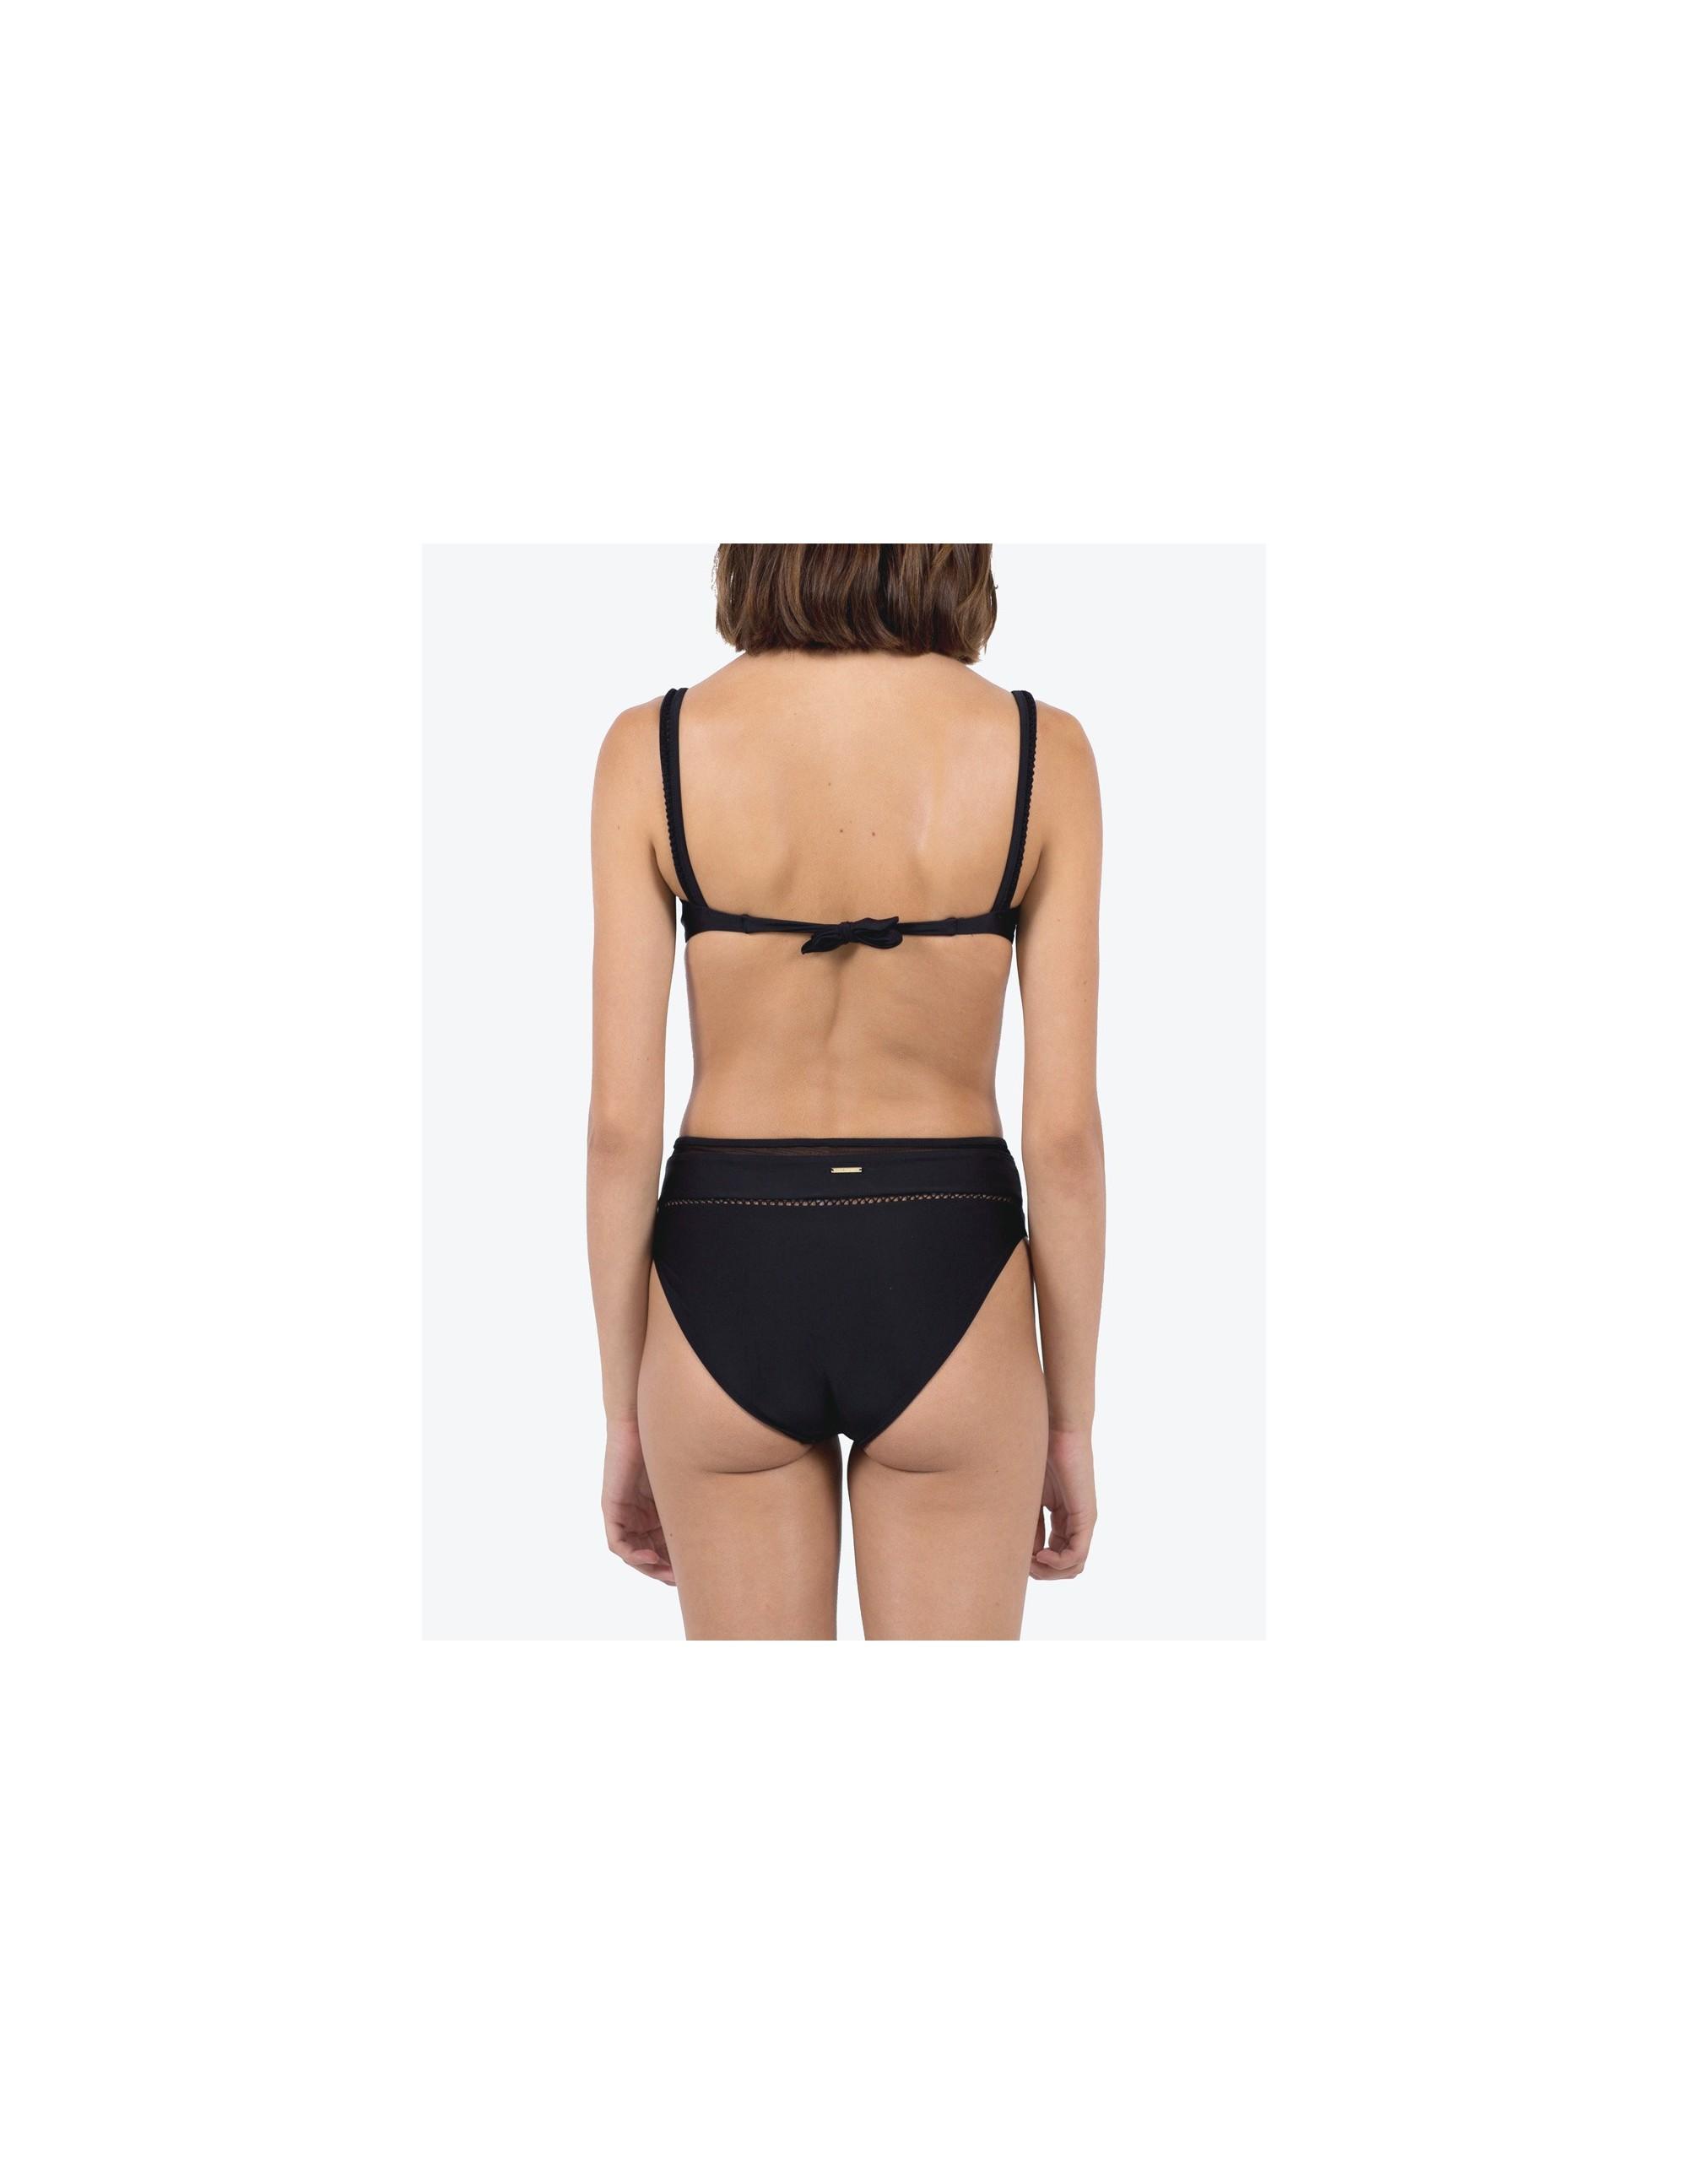 SIMOS bikini bottom - MATTE BLACK